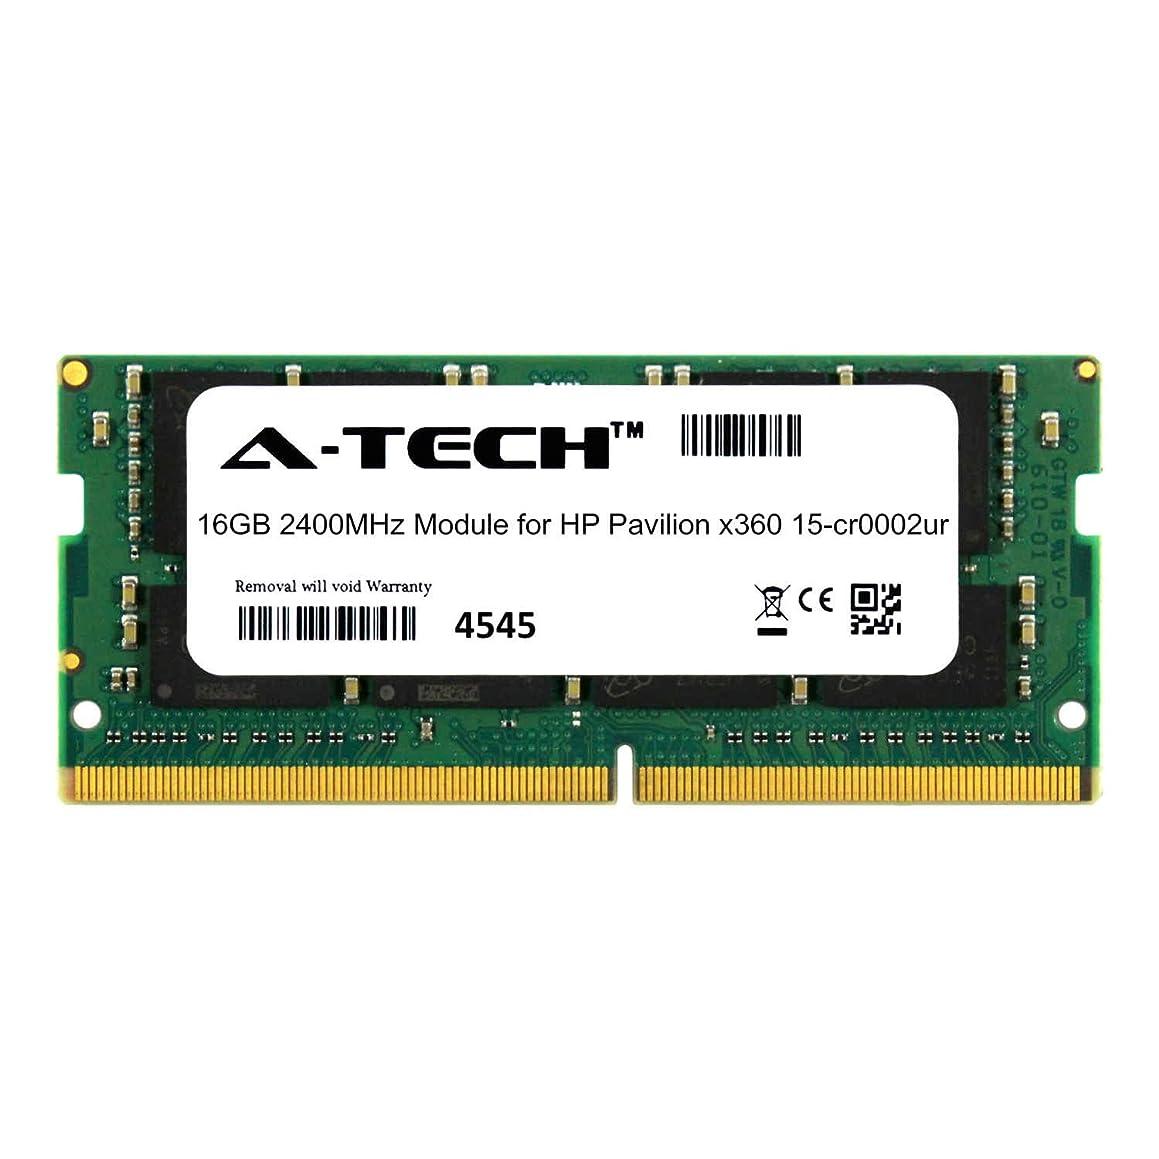 A-Tech 16GB Module for HP Pavilion x360 15-cr0002ur Laptop & Notebook Compatible DDR4 2400Mhz Memory Ram (ATMS305910A25831X1)